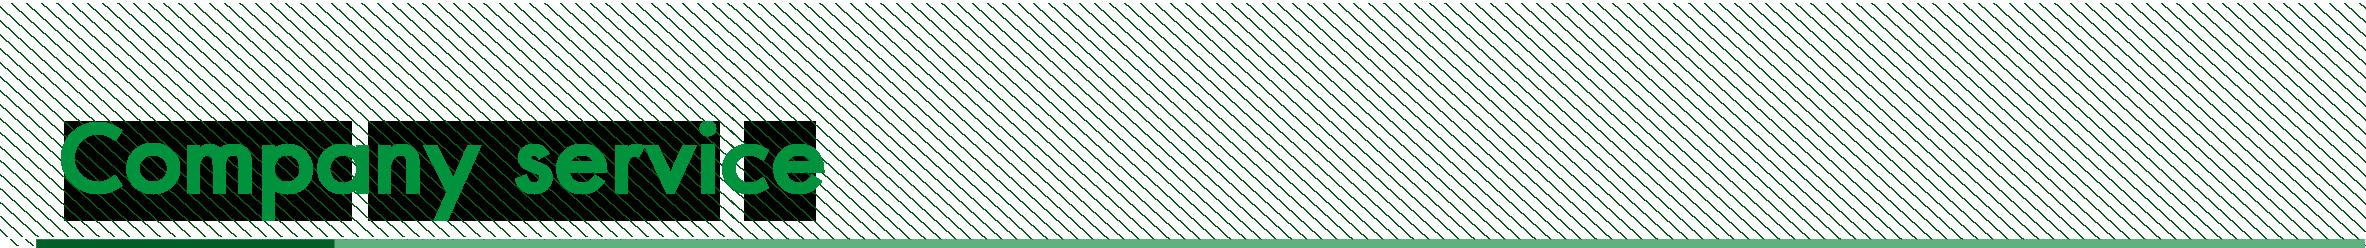 20200720-Banner-27-01